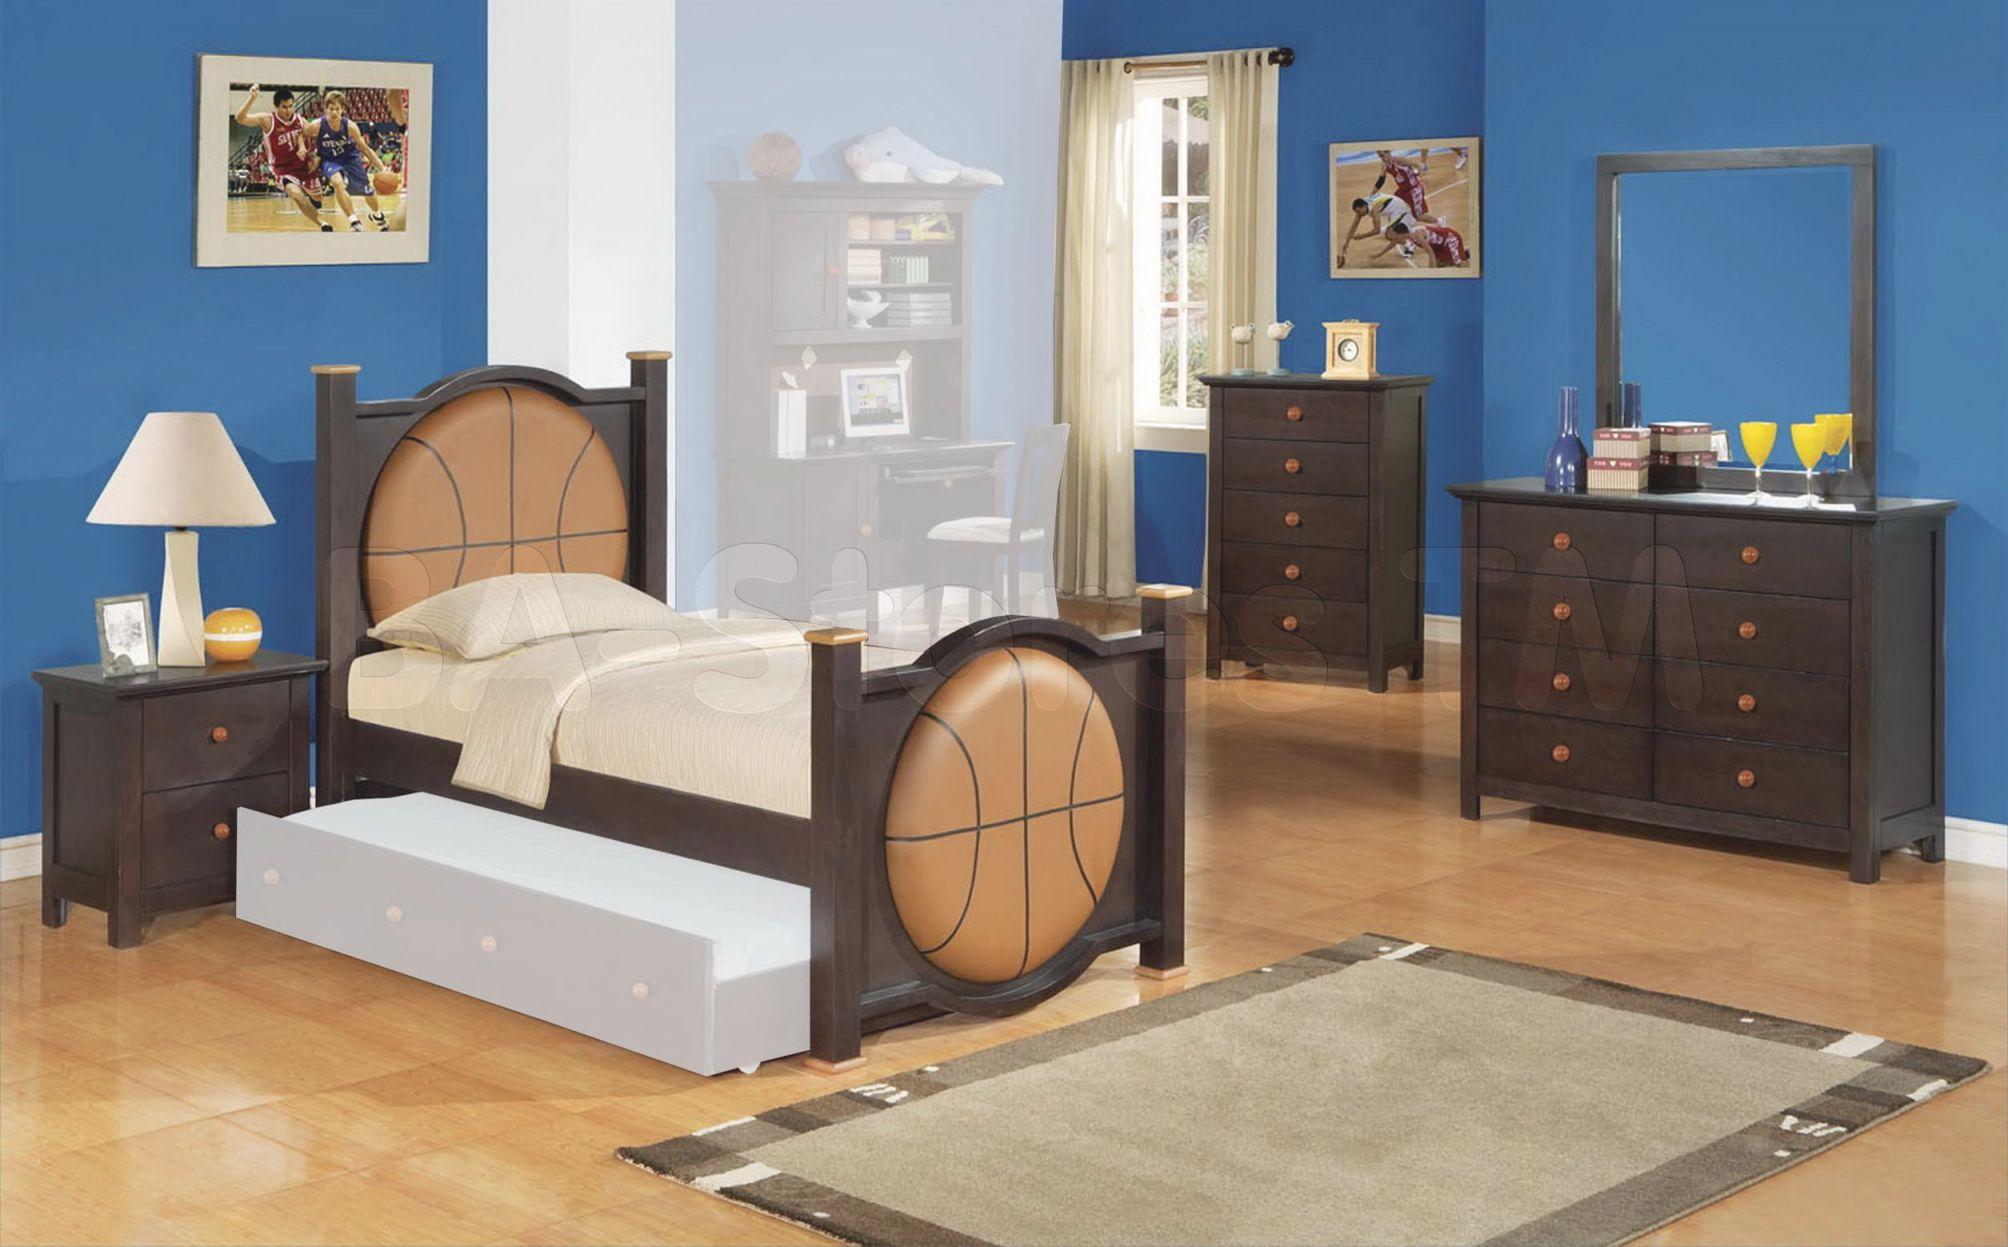 Bedroom Design : Kids Furniture Cheap Cebufurnitures Com pertaining to Lovely Boys Bedroom Furniture Sets